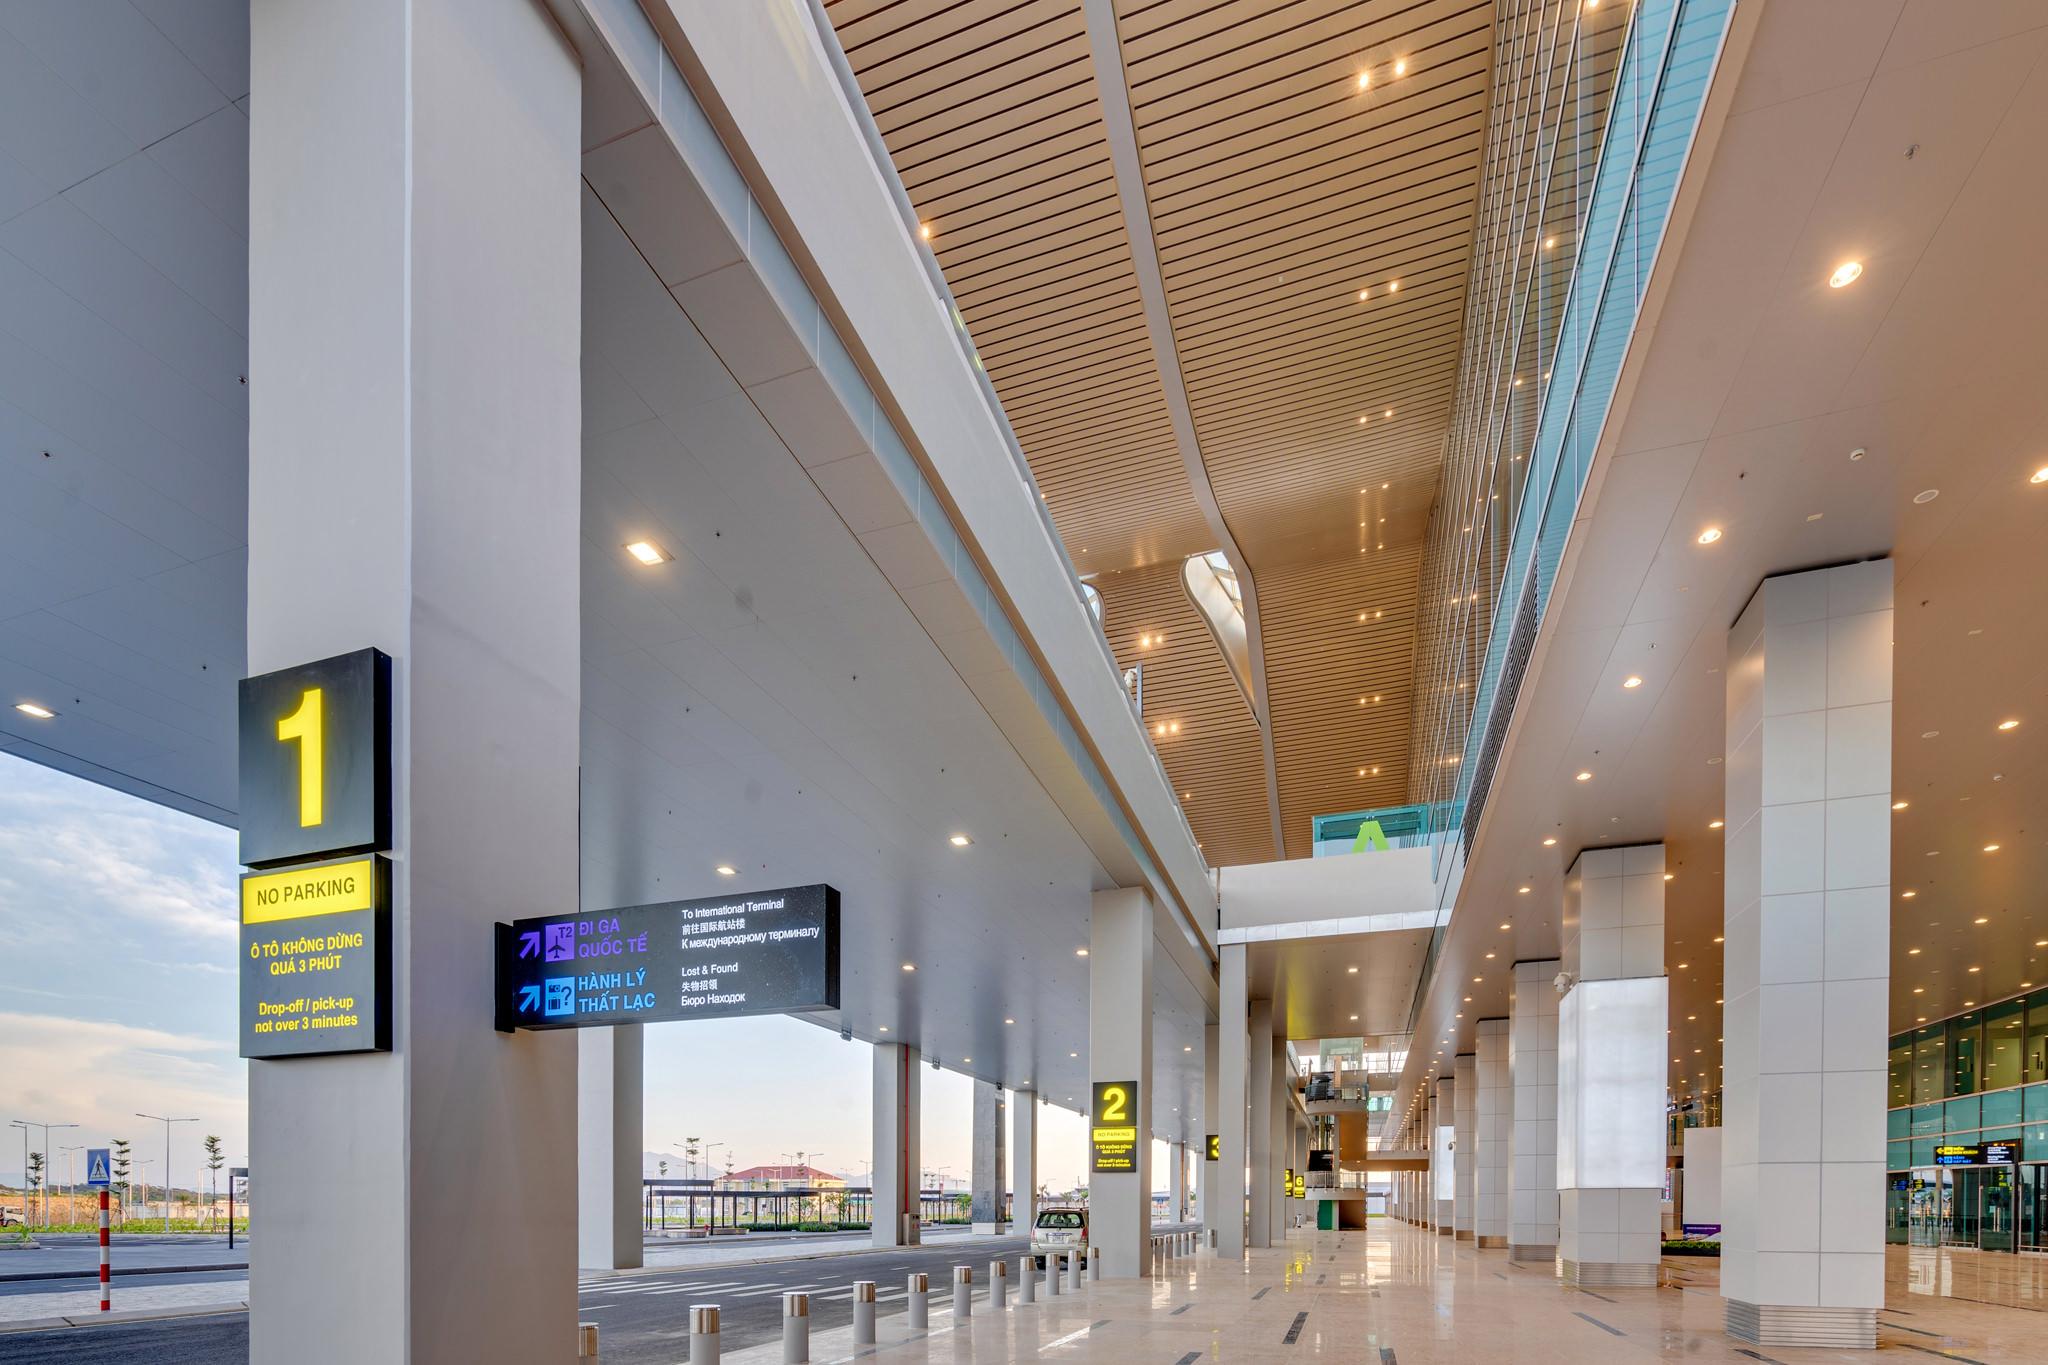 20180626 - Cam Ranh Airport - Architecture - 0037.jpg